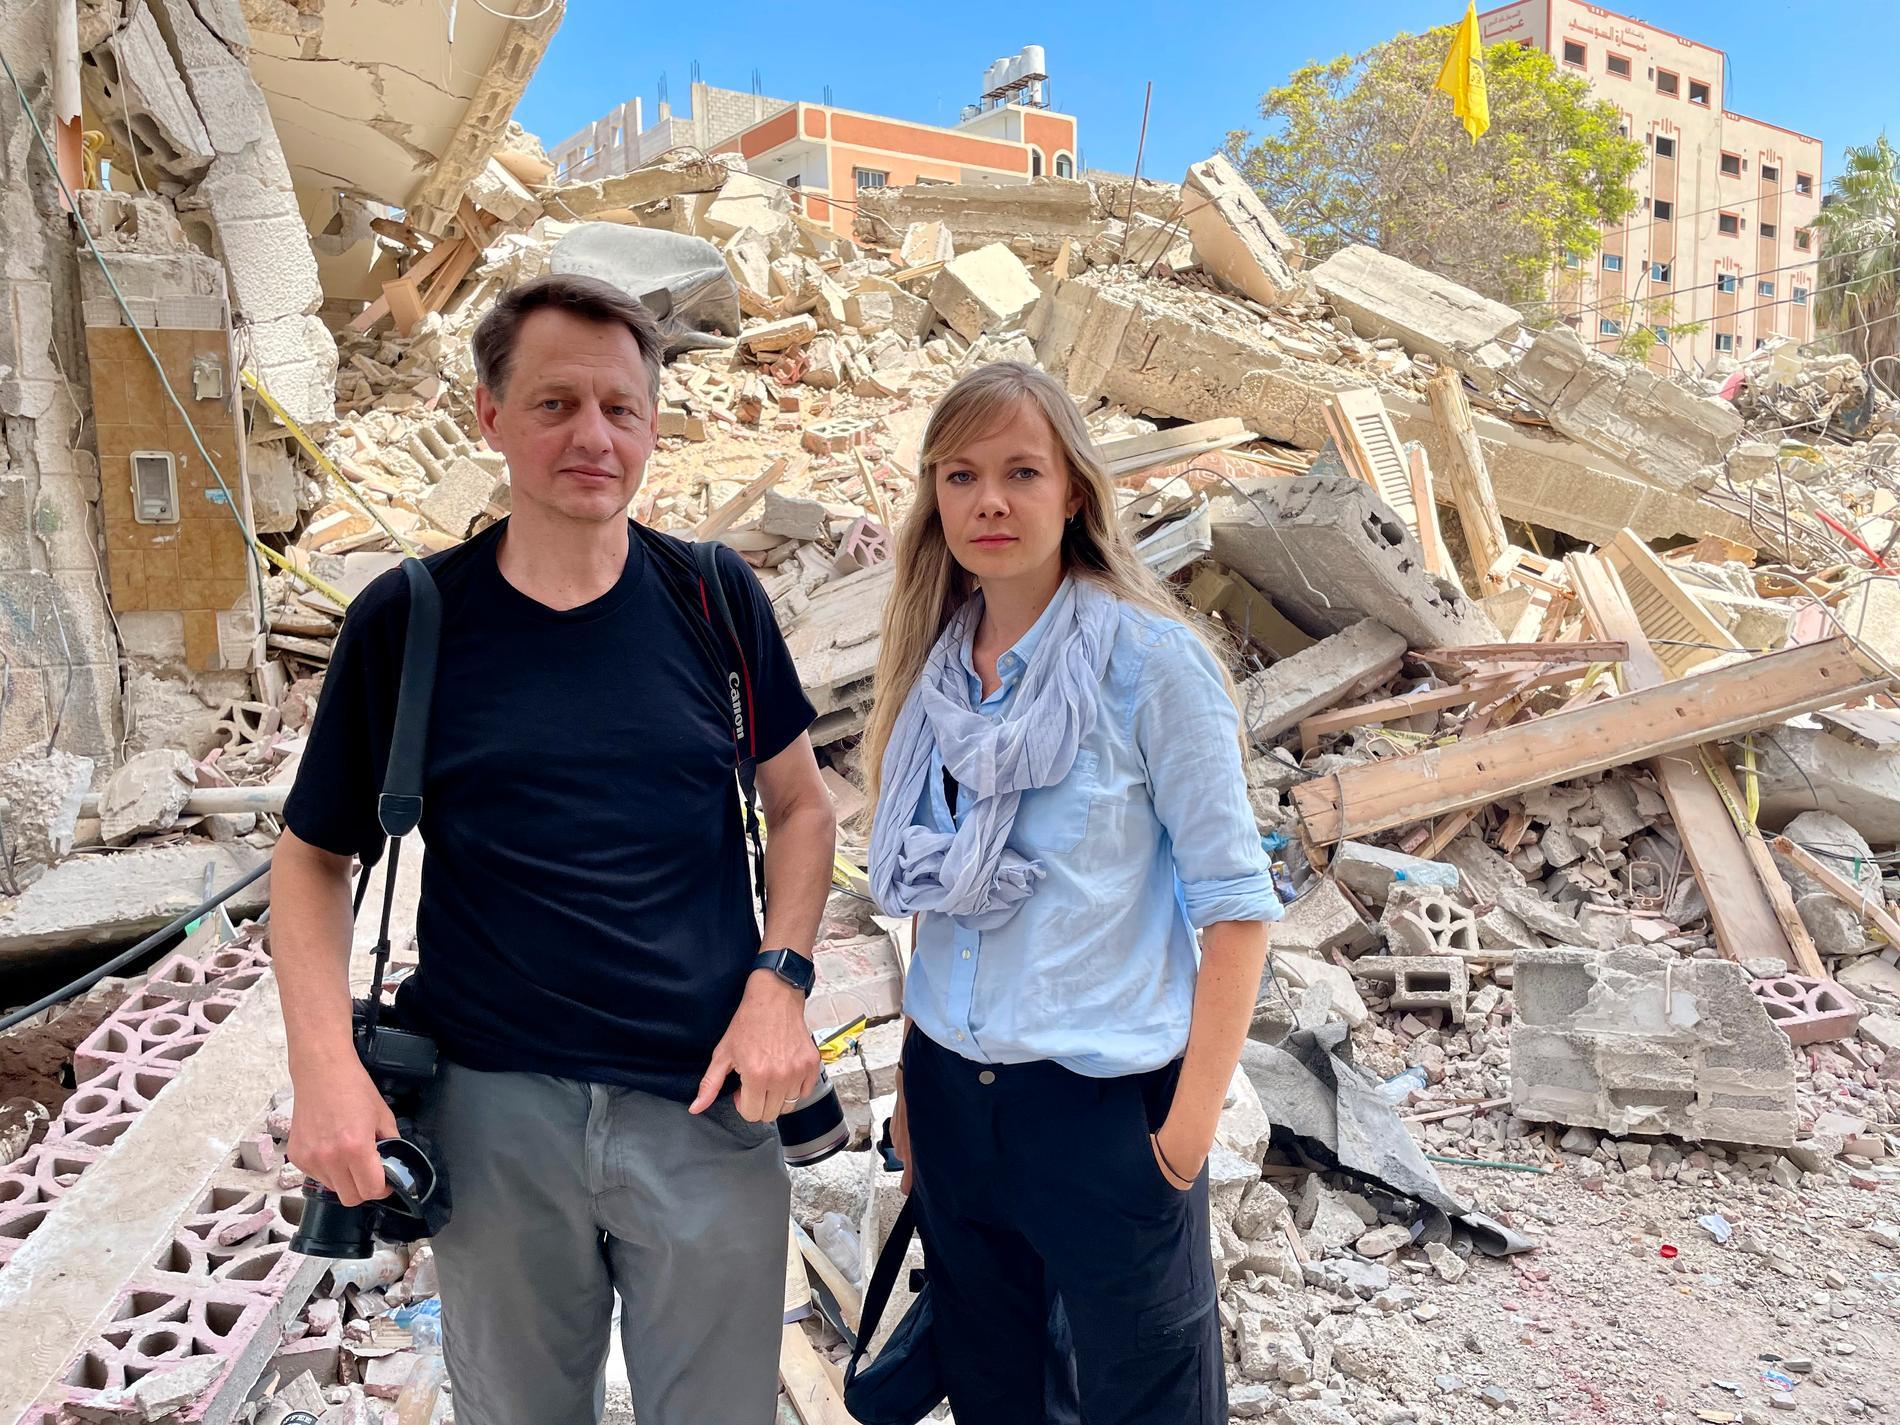 Fotograf Thomas Nilsson och reporter Emelie Svensson, på plats i Gaza.